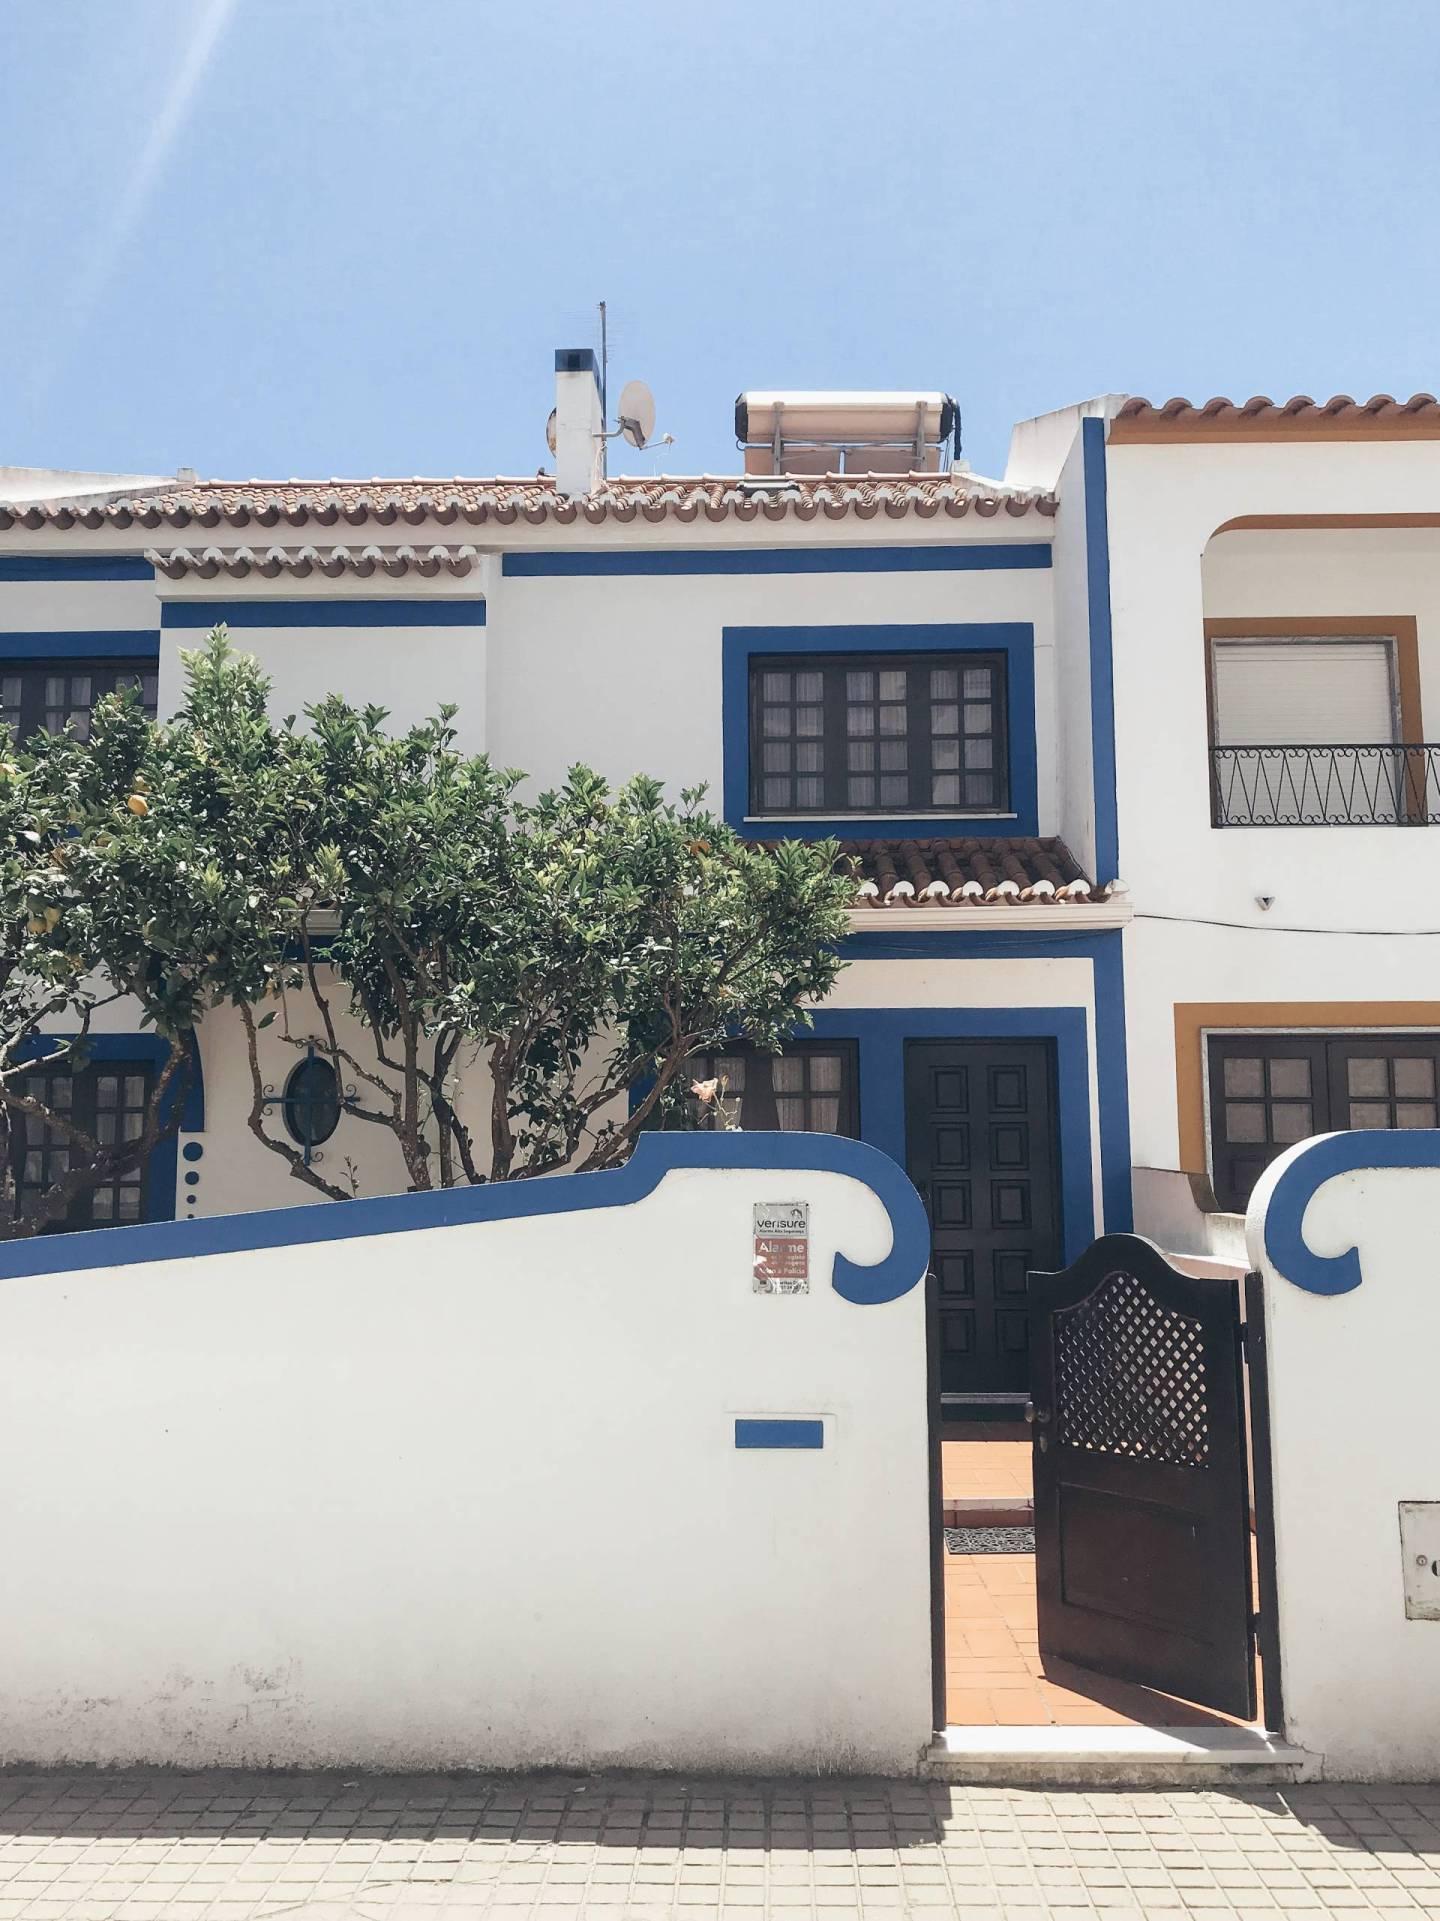 The Best Coastal Region in Portugal (Hint: it's not the Algarve).